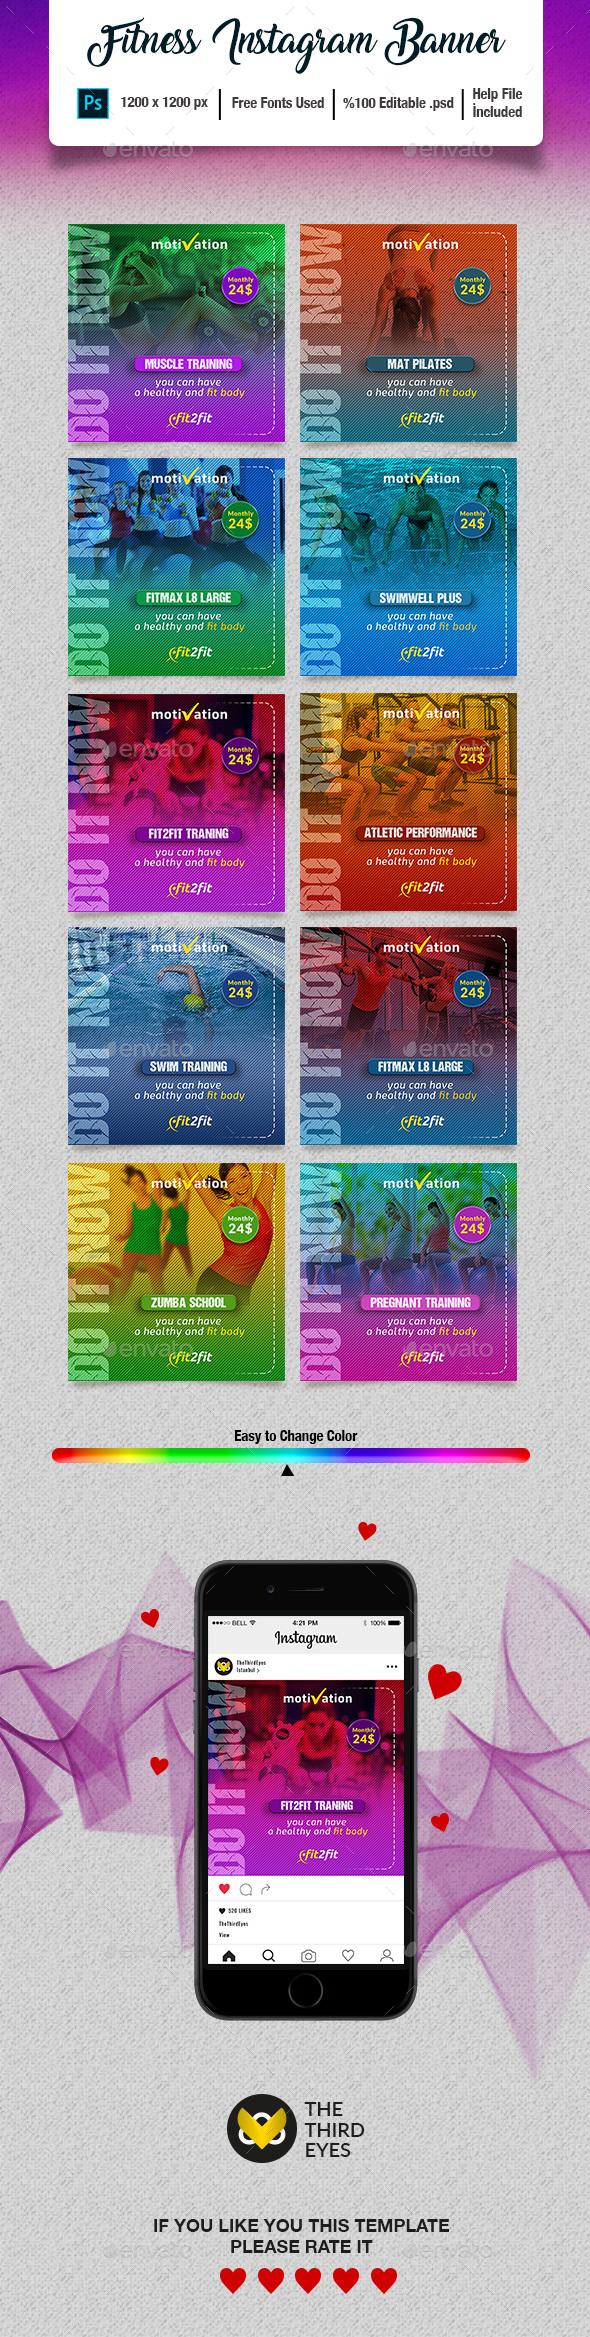 Fitness Instagram Banner Pack - Social Media Web Elements